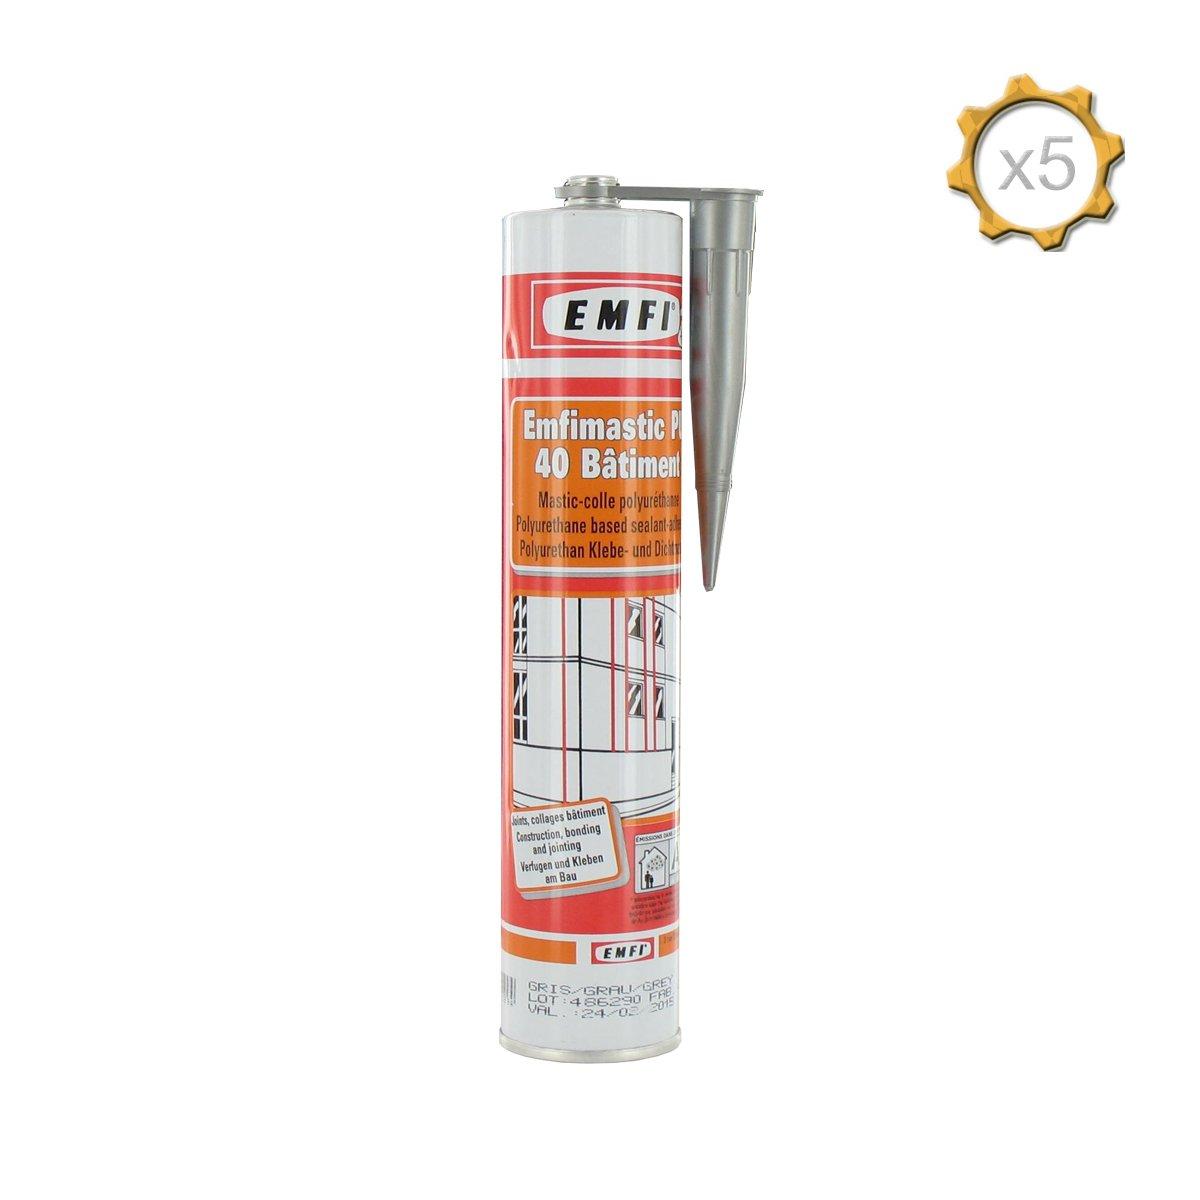 Mastic polyuré thane gris EMFI PU 40 bâ timent 310ml x 5